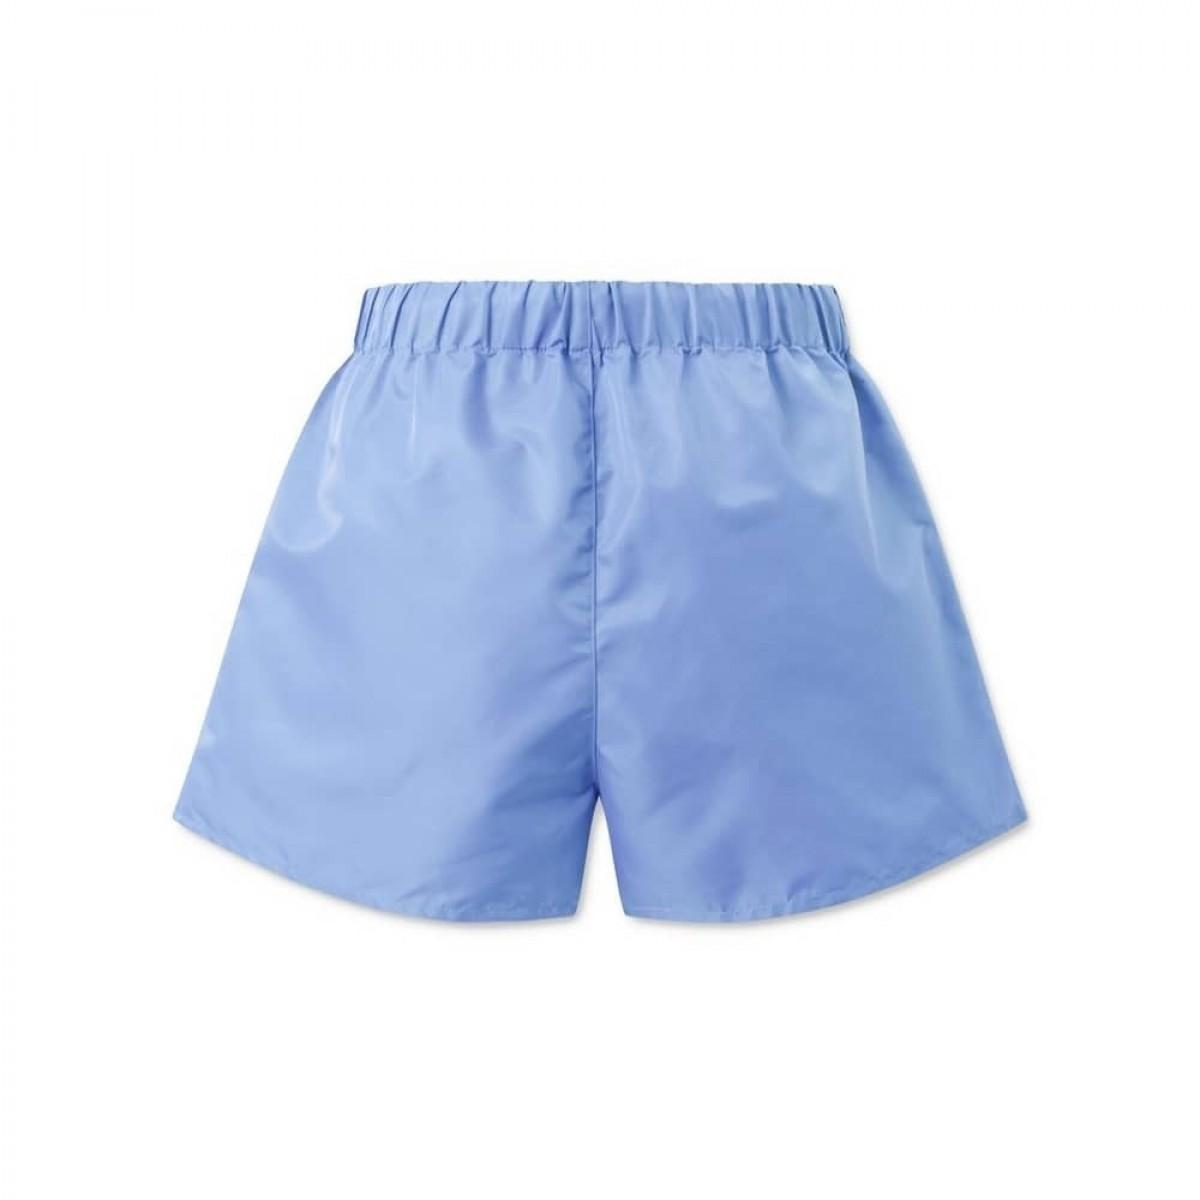 alessio shorts - sky blue - bag